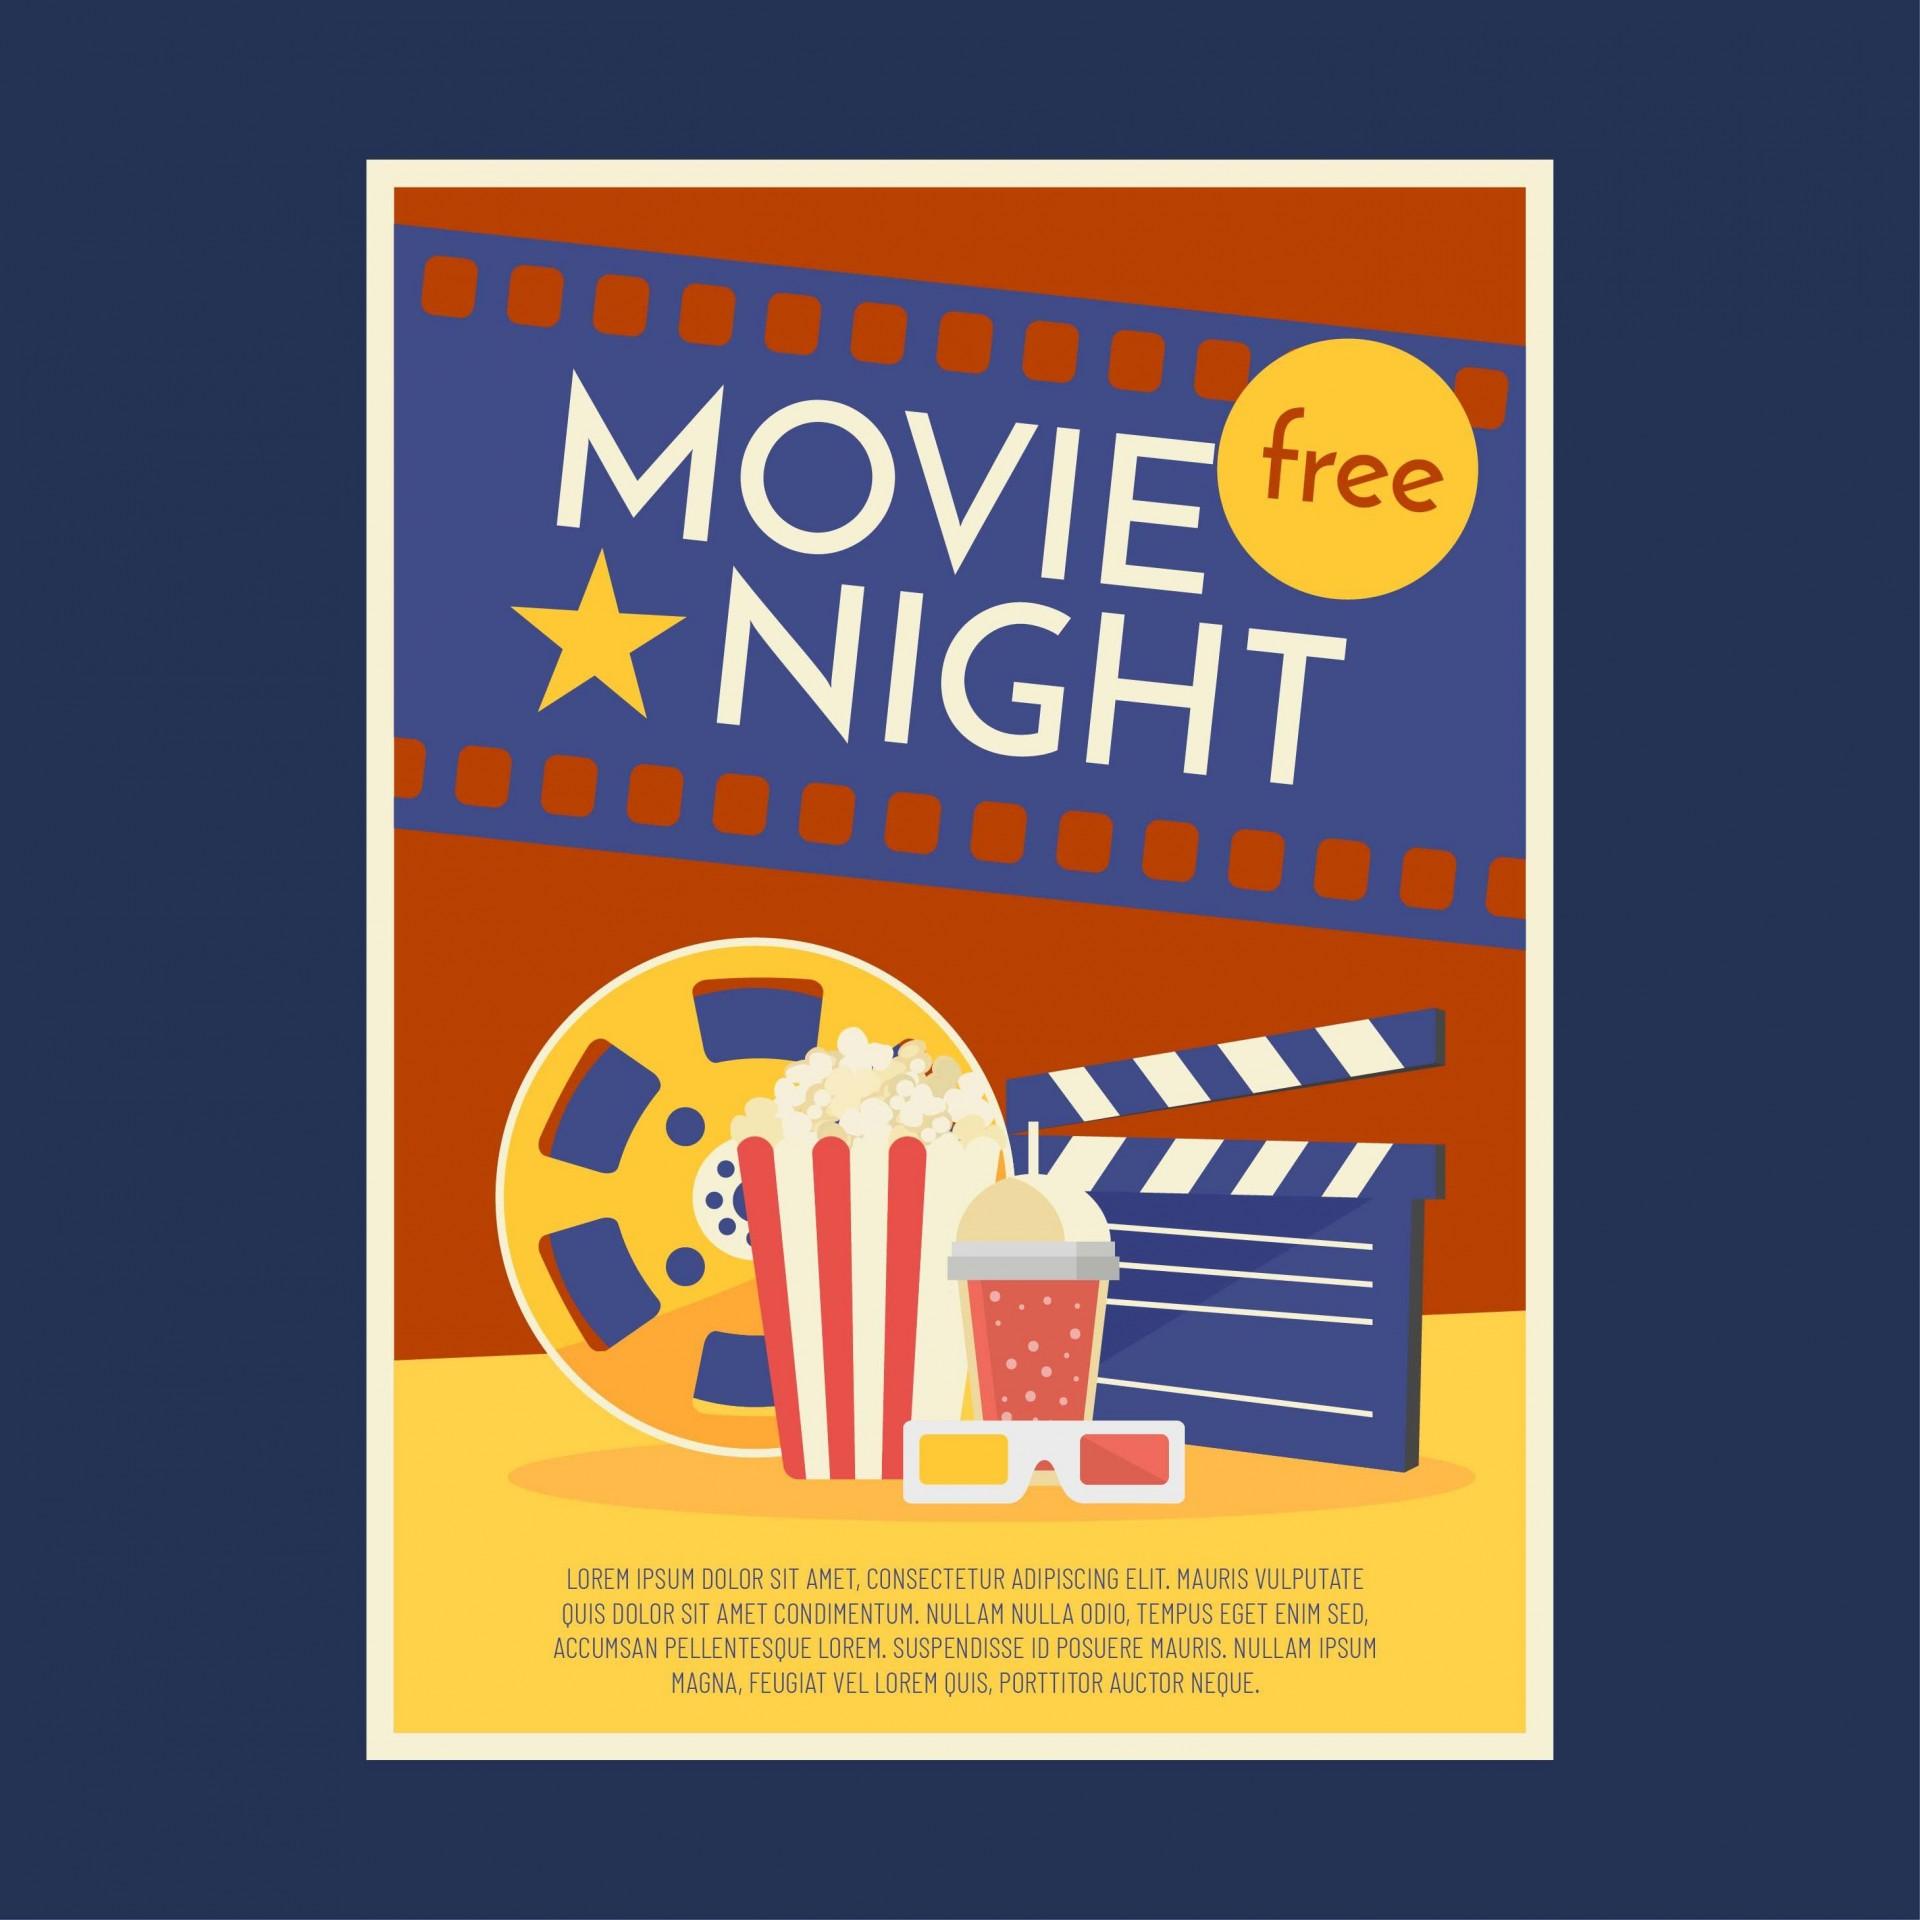 007 Impressive Movie Night Flyer Template Inspiration  Editable Psd Free1920